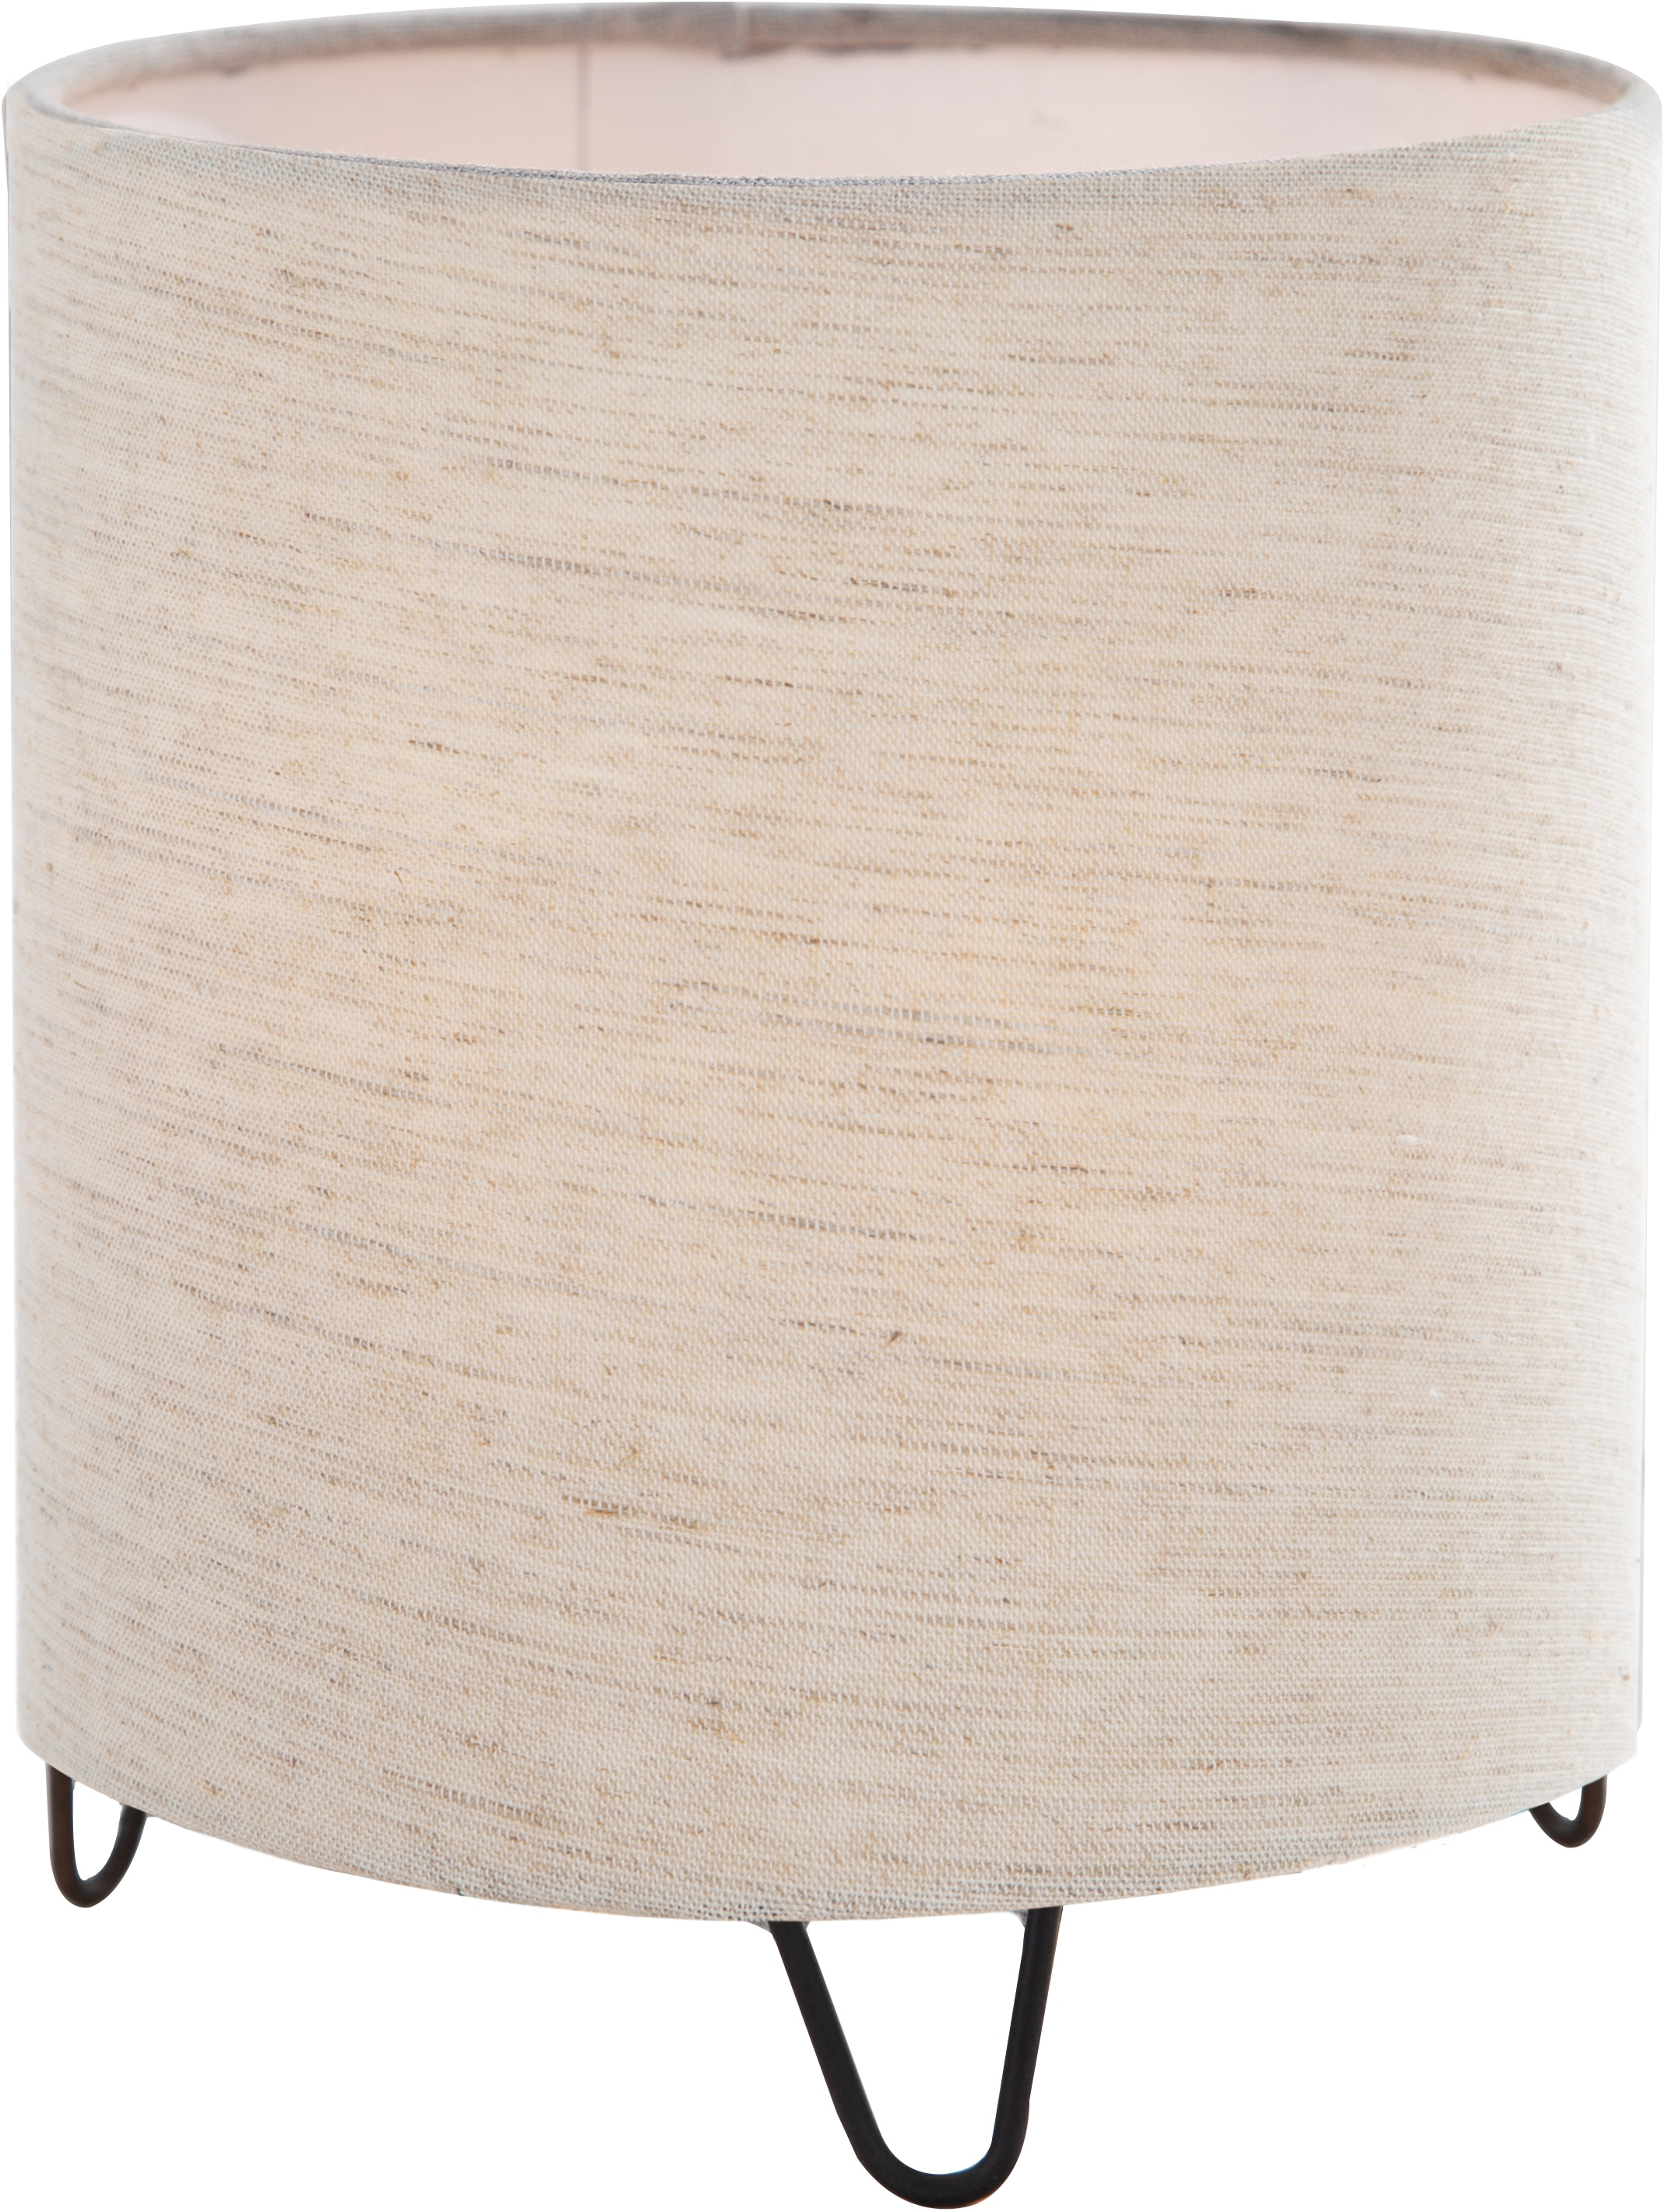 Nino Leuchten LED Tischleuchte Lee, E14, 1 St., Neutralweiß, inkl. 1x E14 Leuchtmittel